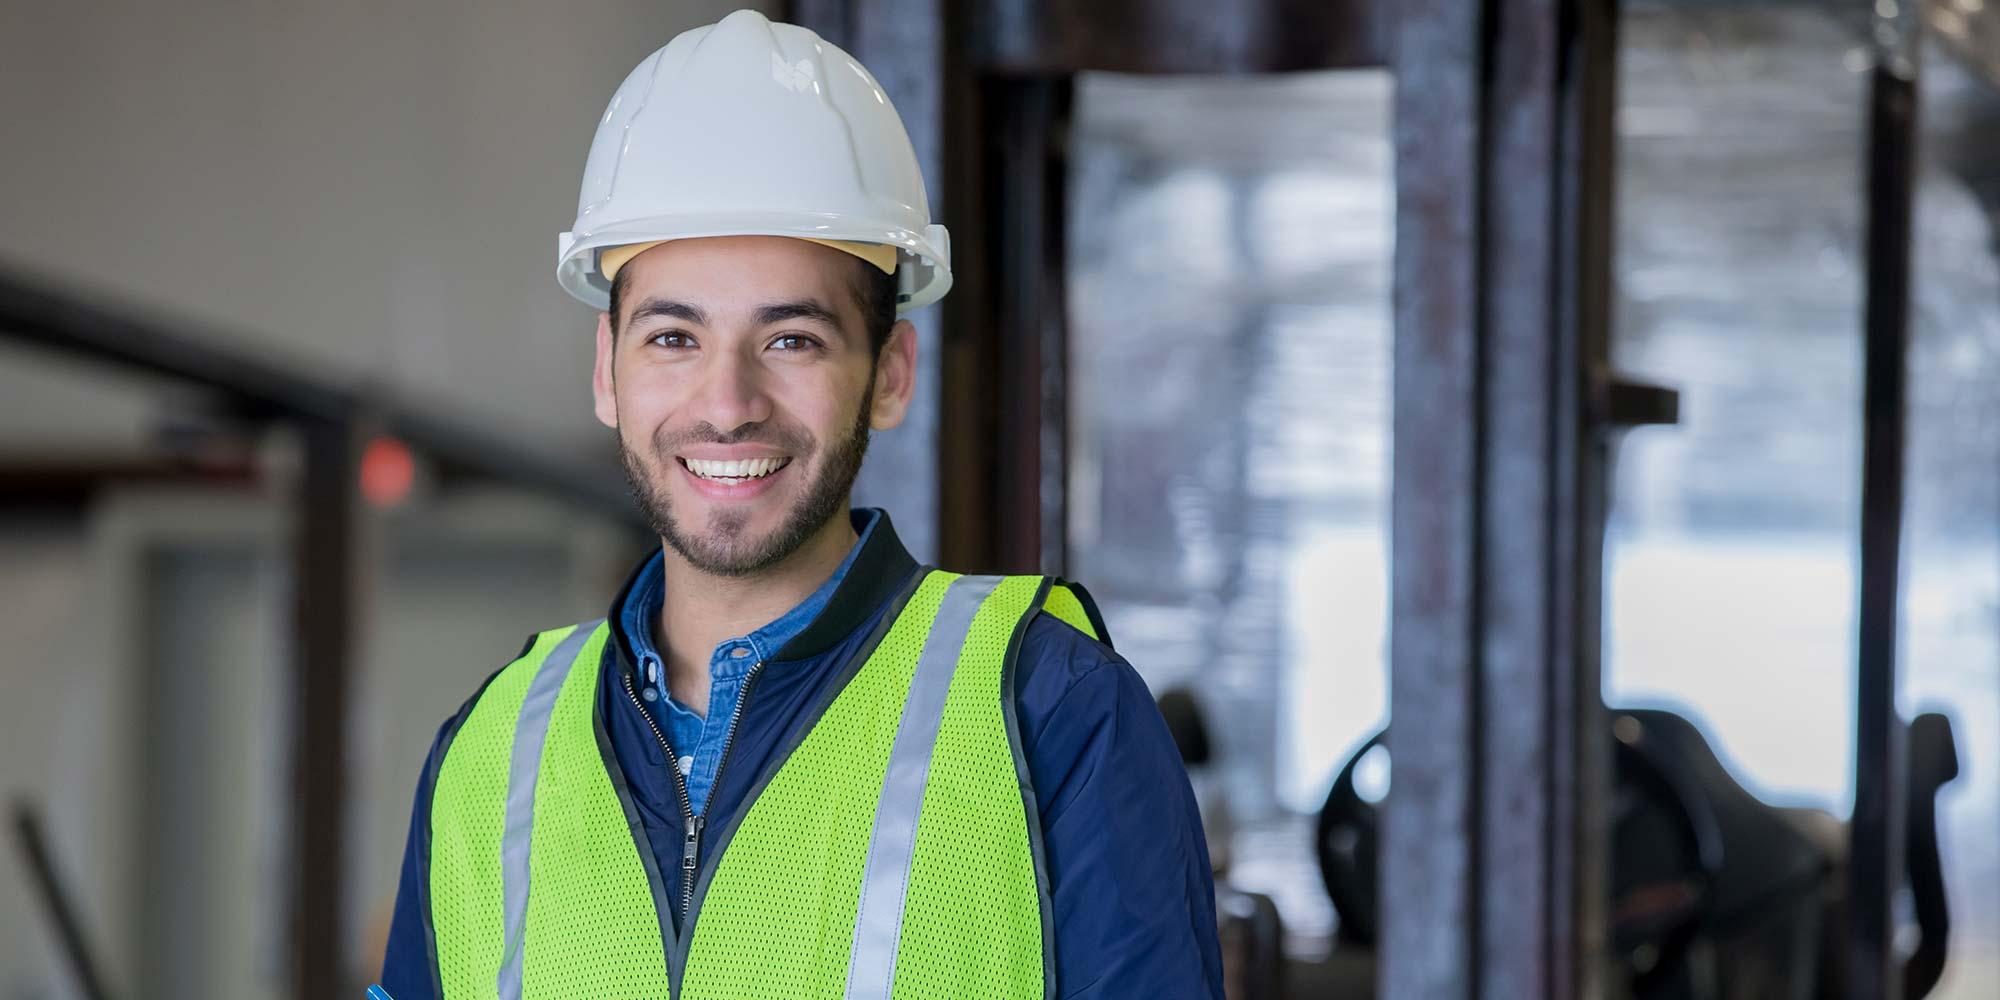 wk-cch-intelliconnect-employment-whs-work-health-safety-header-background